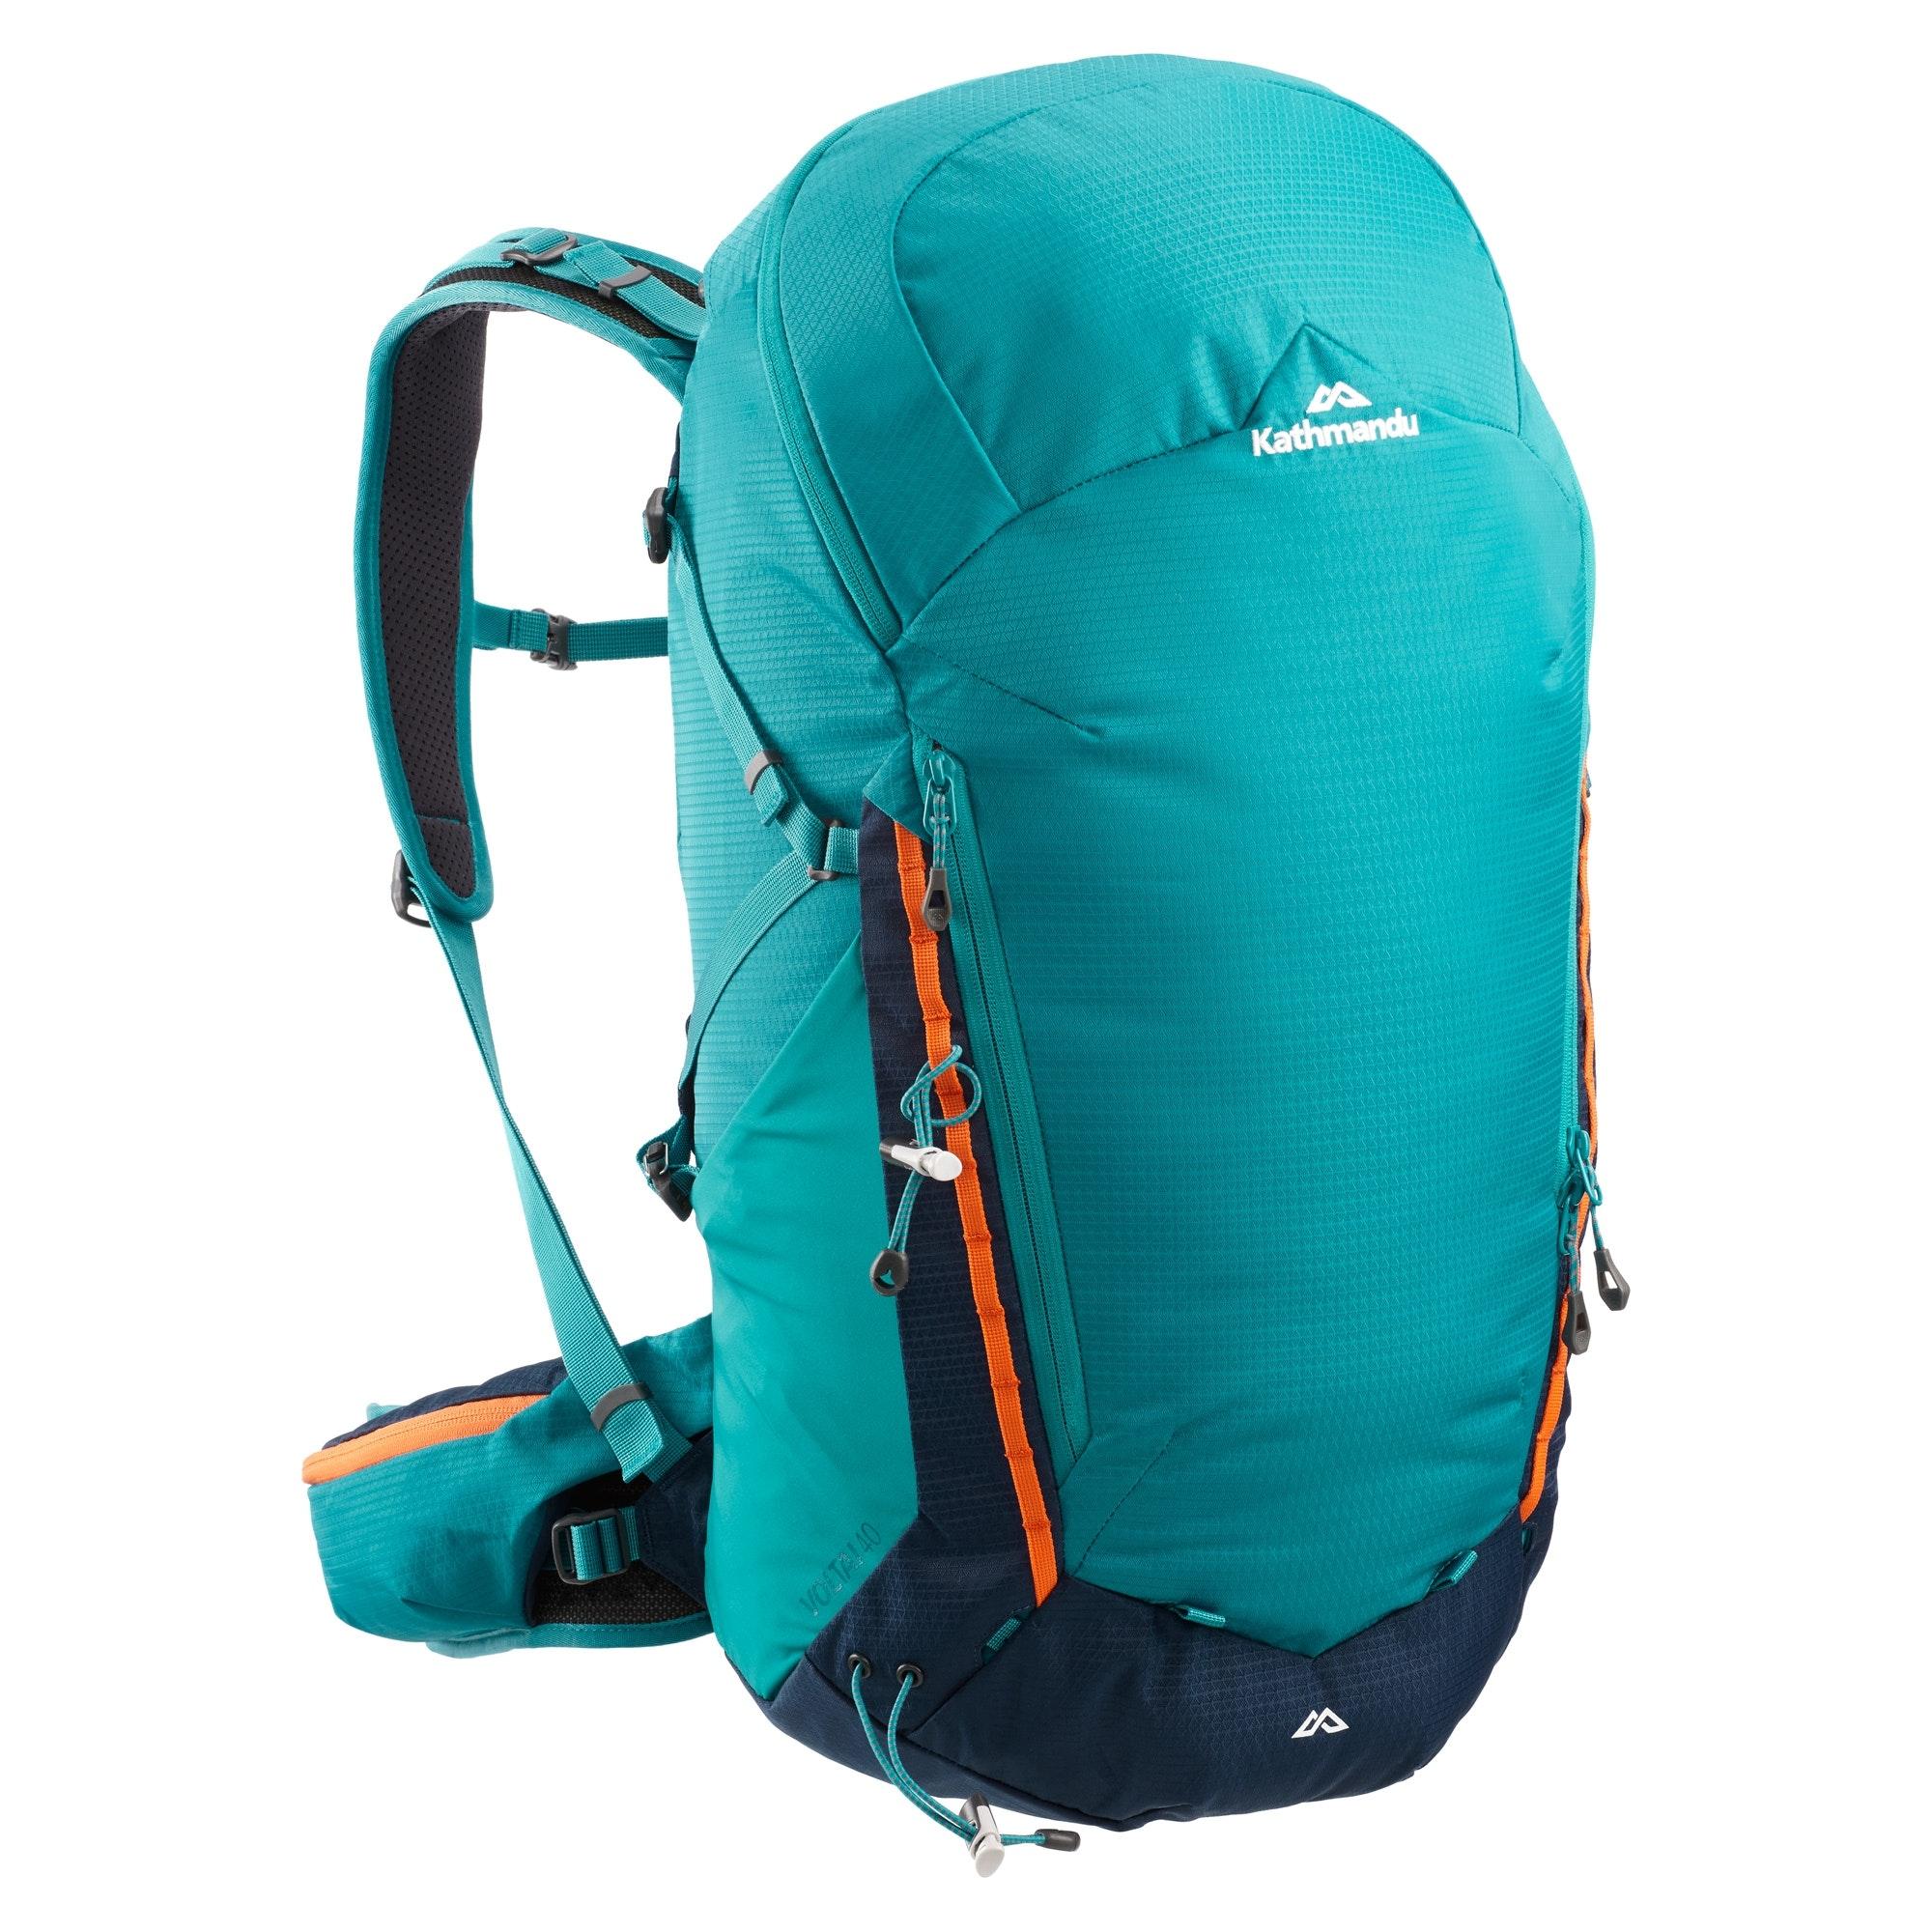 99ba5fef85 NEW Kathmandu Voltai Hiking Walking Travel Outdoor Backpack Rucksack ...